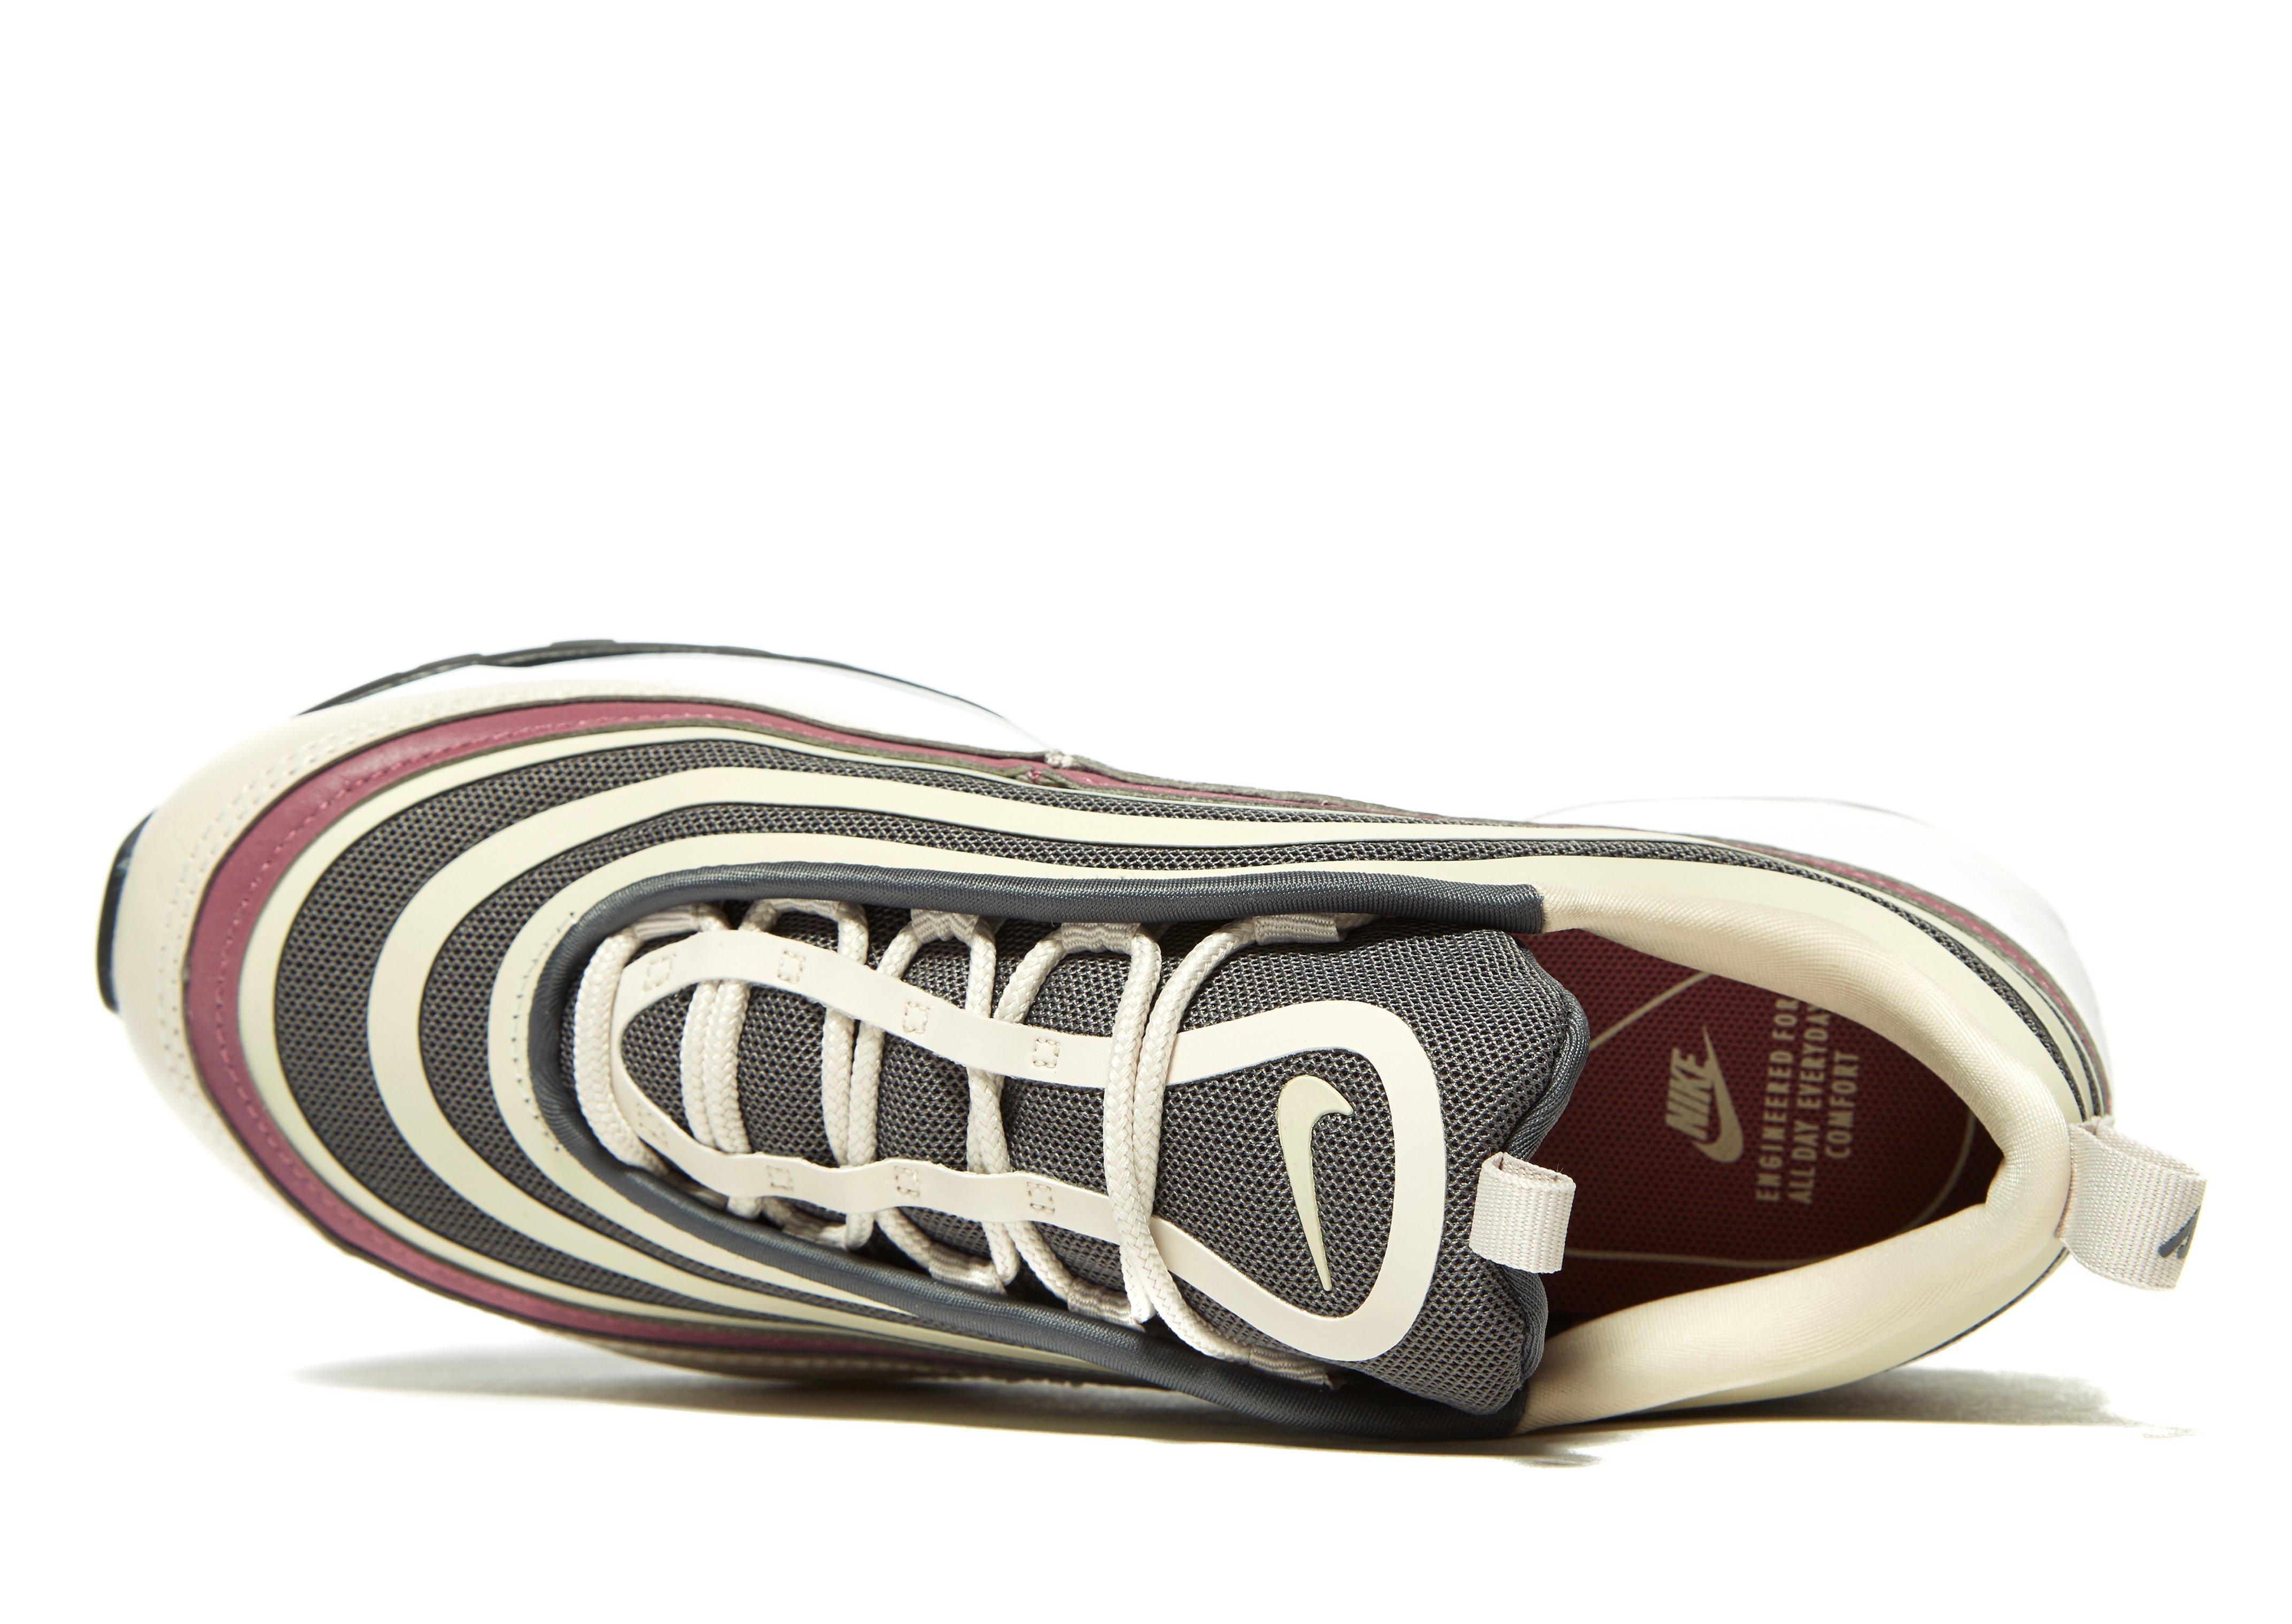 in toptan ucuz ayakkab ,Aliexpress Ucuz Toptan Hava Max 97 Nike